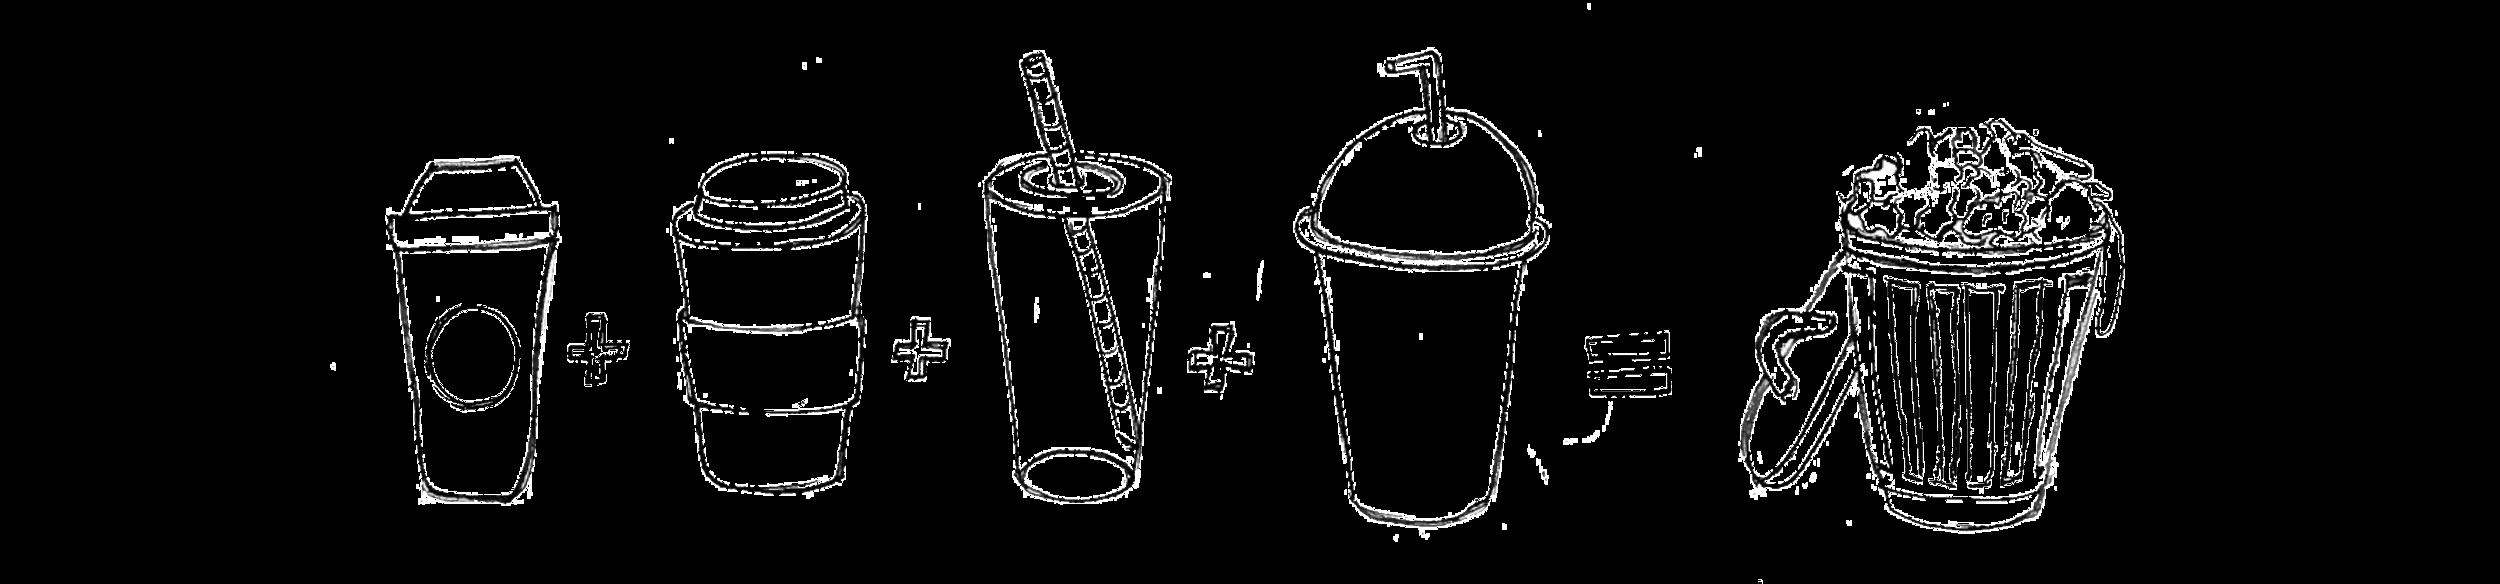 coffee trash - 3.png